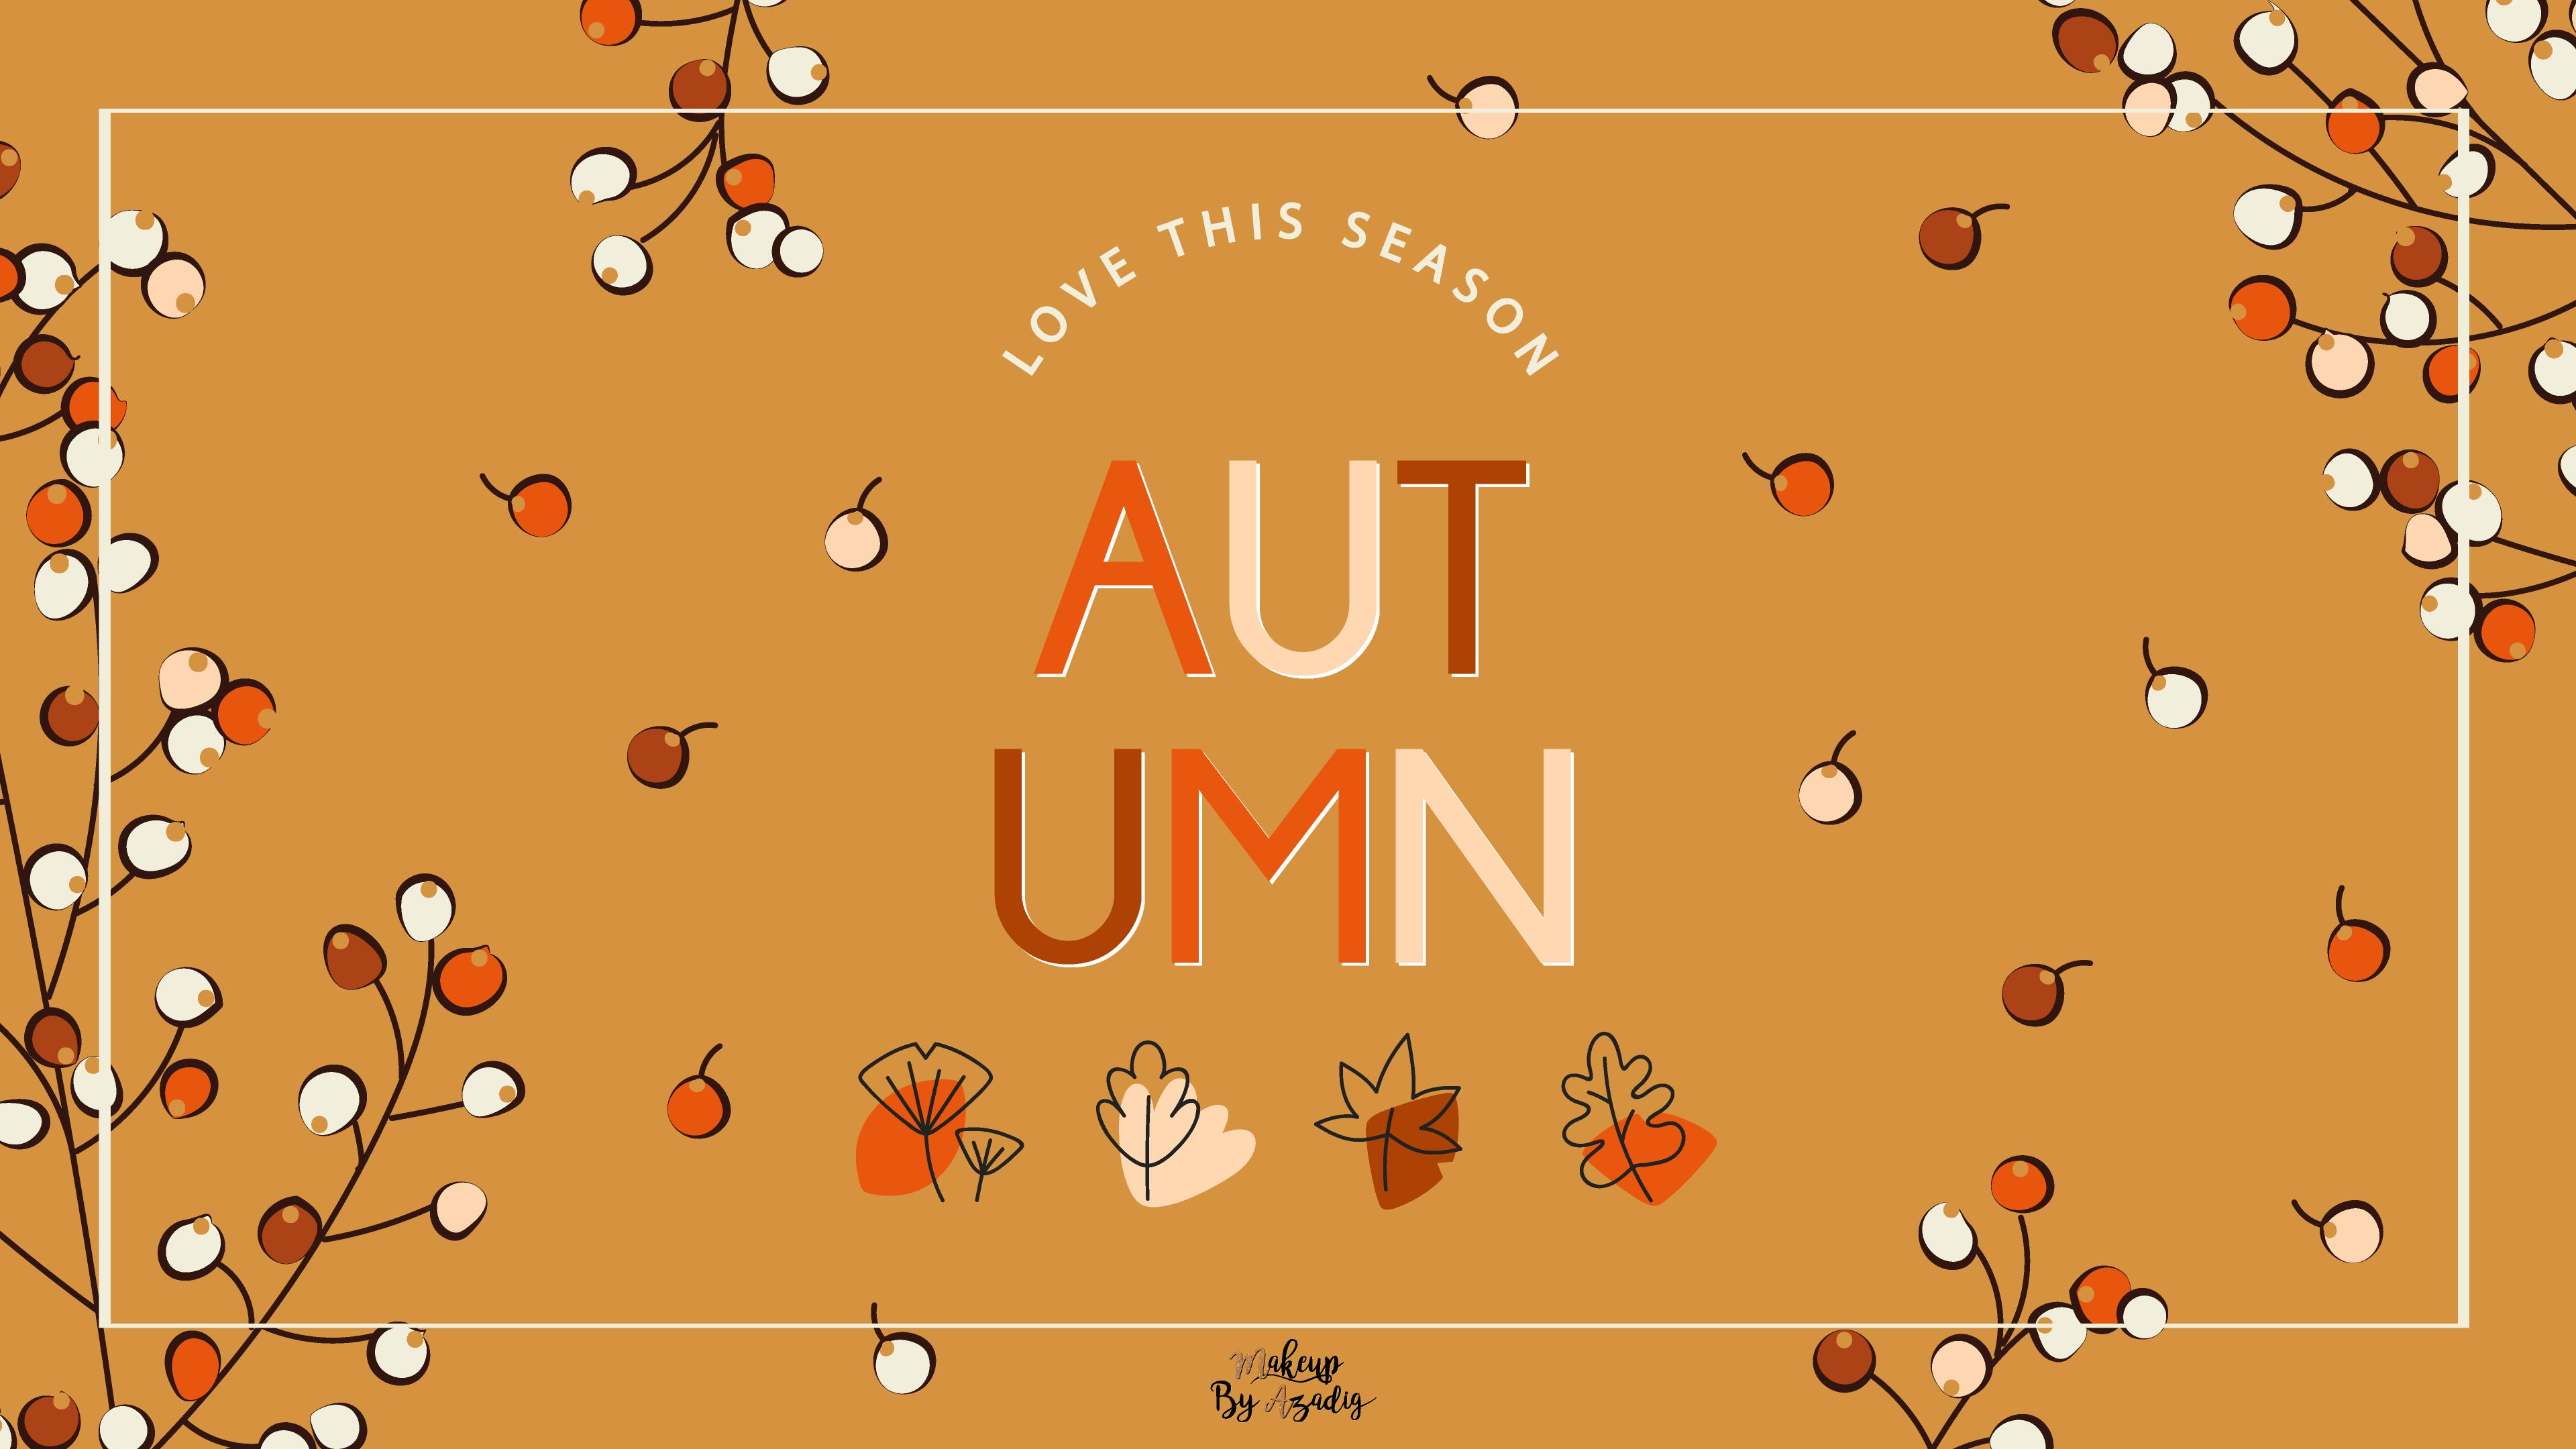 fond-decran-wallpaper-automne-leaves-autumn-season-ordinateur-mac-macbook-imac-pc-makeupbyazadig-tendance